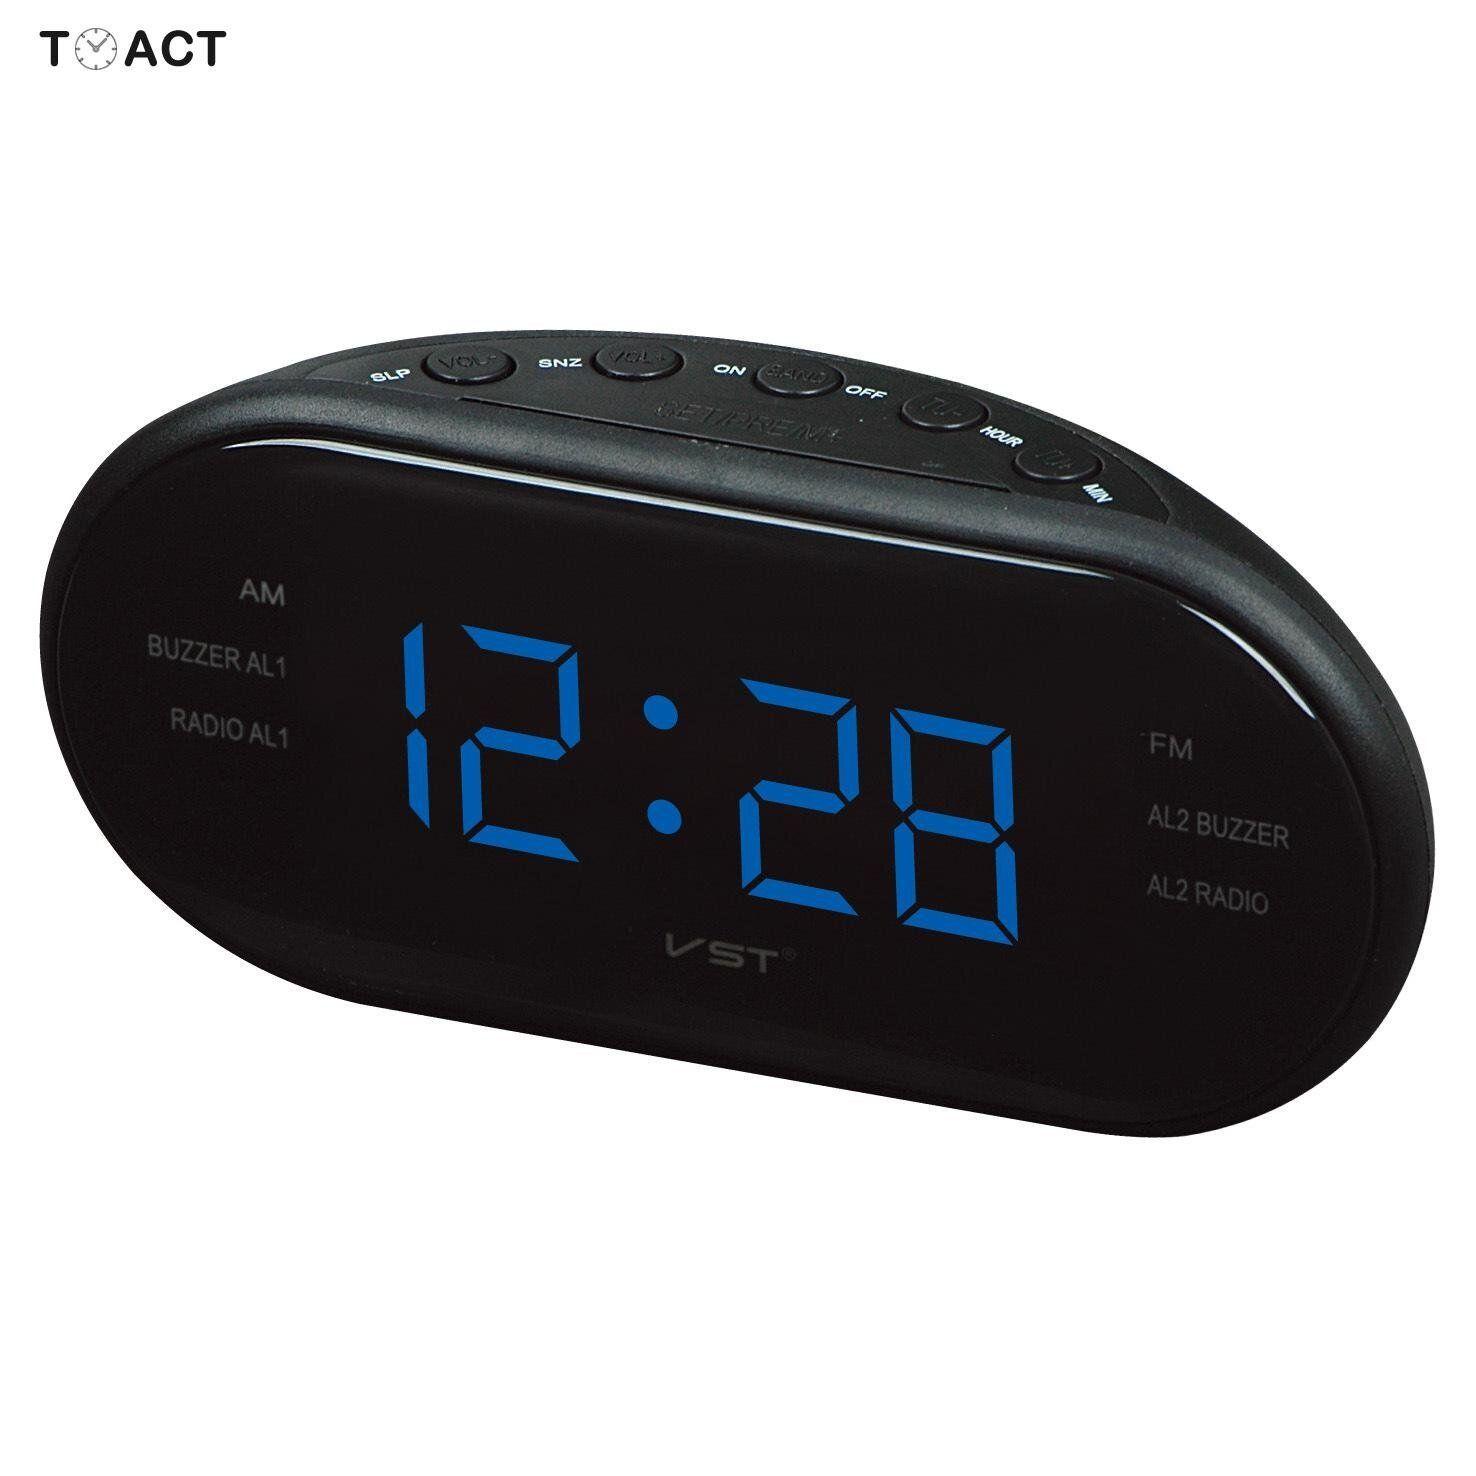 Fm Radio Alarm Clocks Led Digital Luminous Alarm Clock Electronic Watch Table Modern Design Circular Snooze Function Home Decor Radio Alarm Clock Digital Table Clock Led Clock